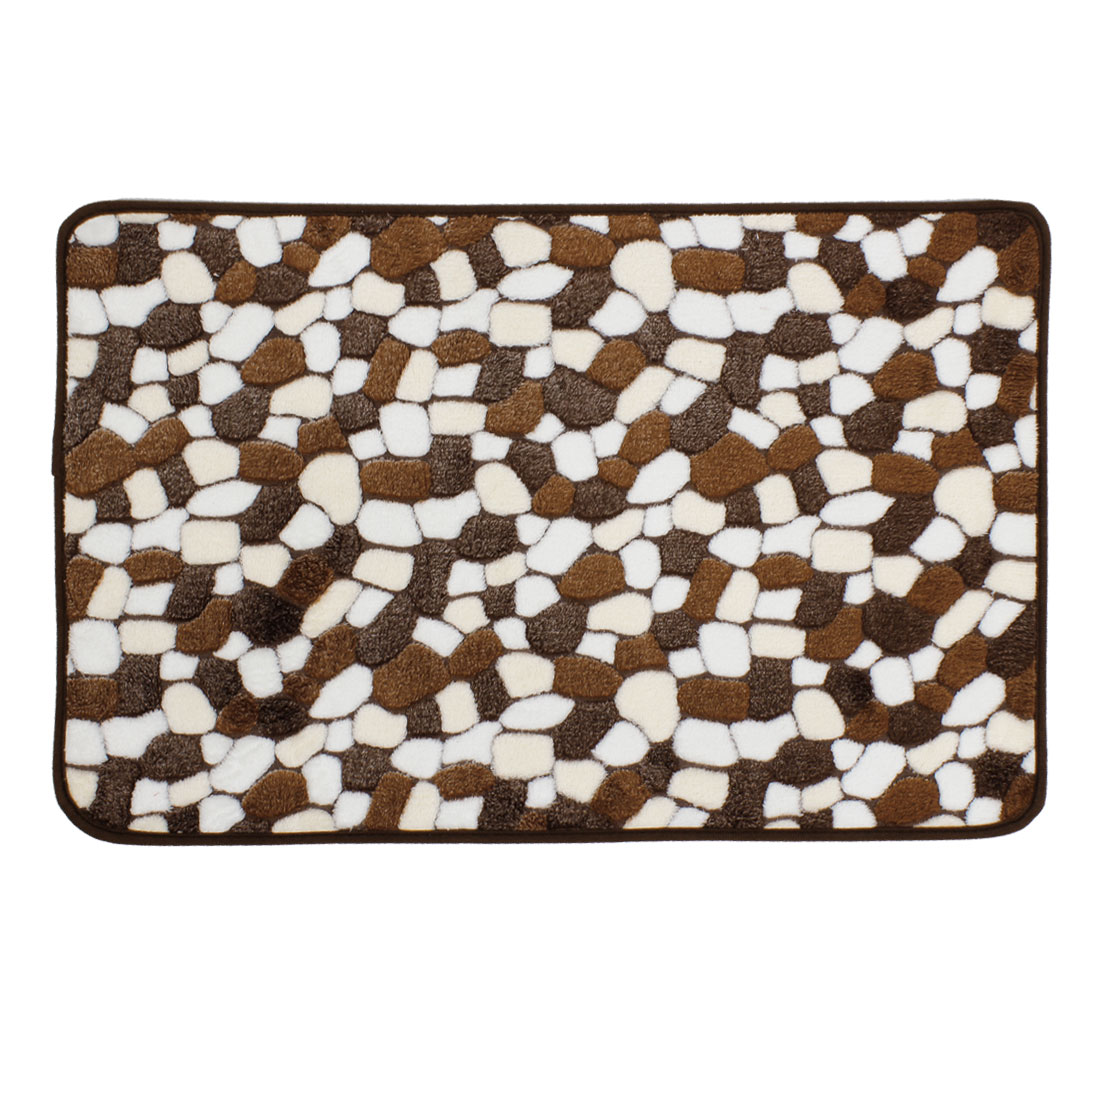 White Brown Cobblestone Patetrn Plush Mat Area Rug Carpet 70cm x 45cm